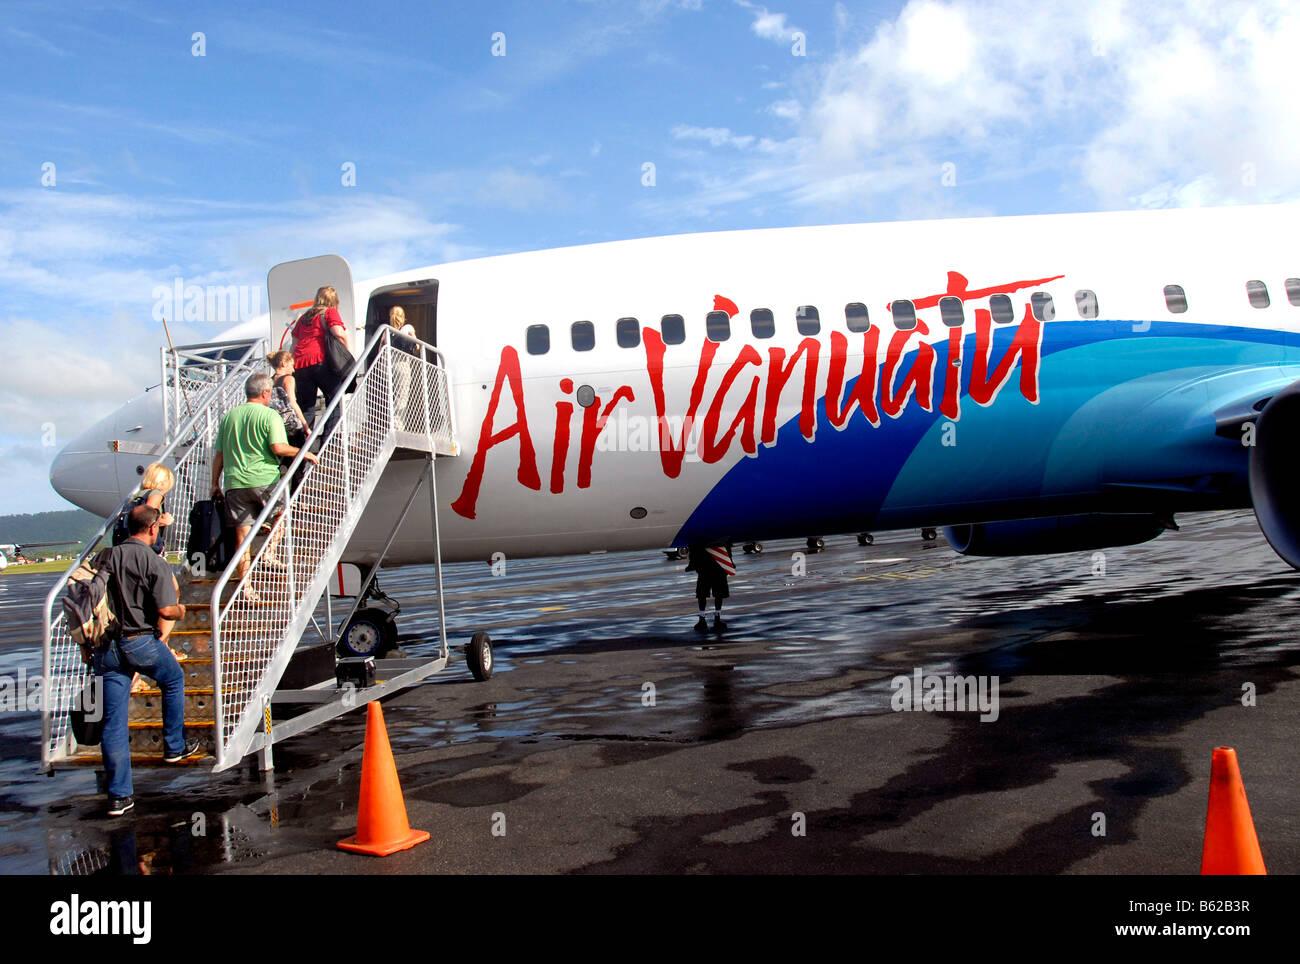 Passengers climbing in Boeing 737 at Bauerfield international airport, Port Vila, Efate island, Vanuatu - Stock Image